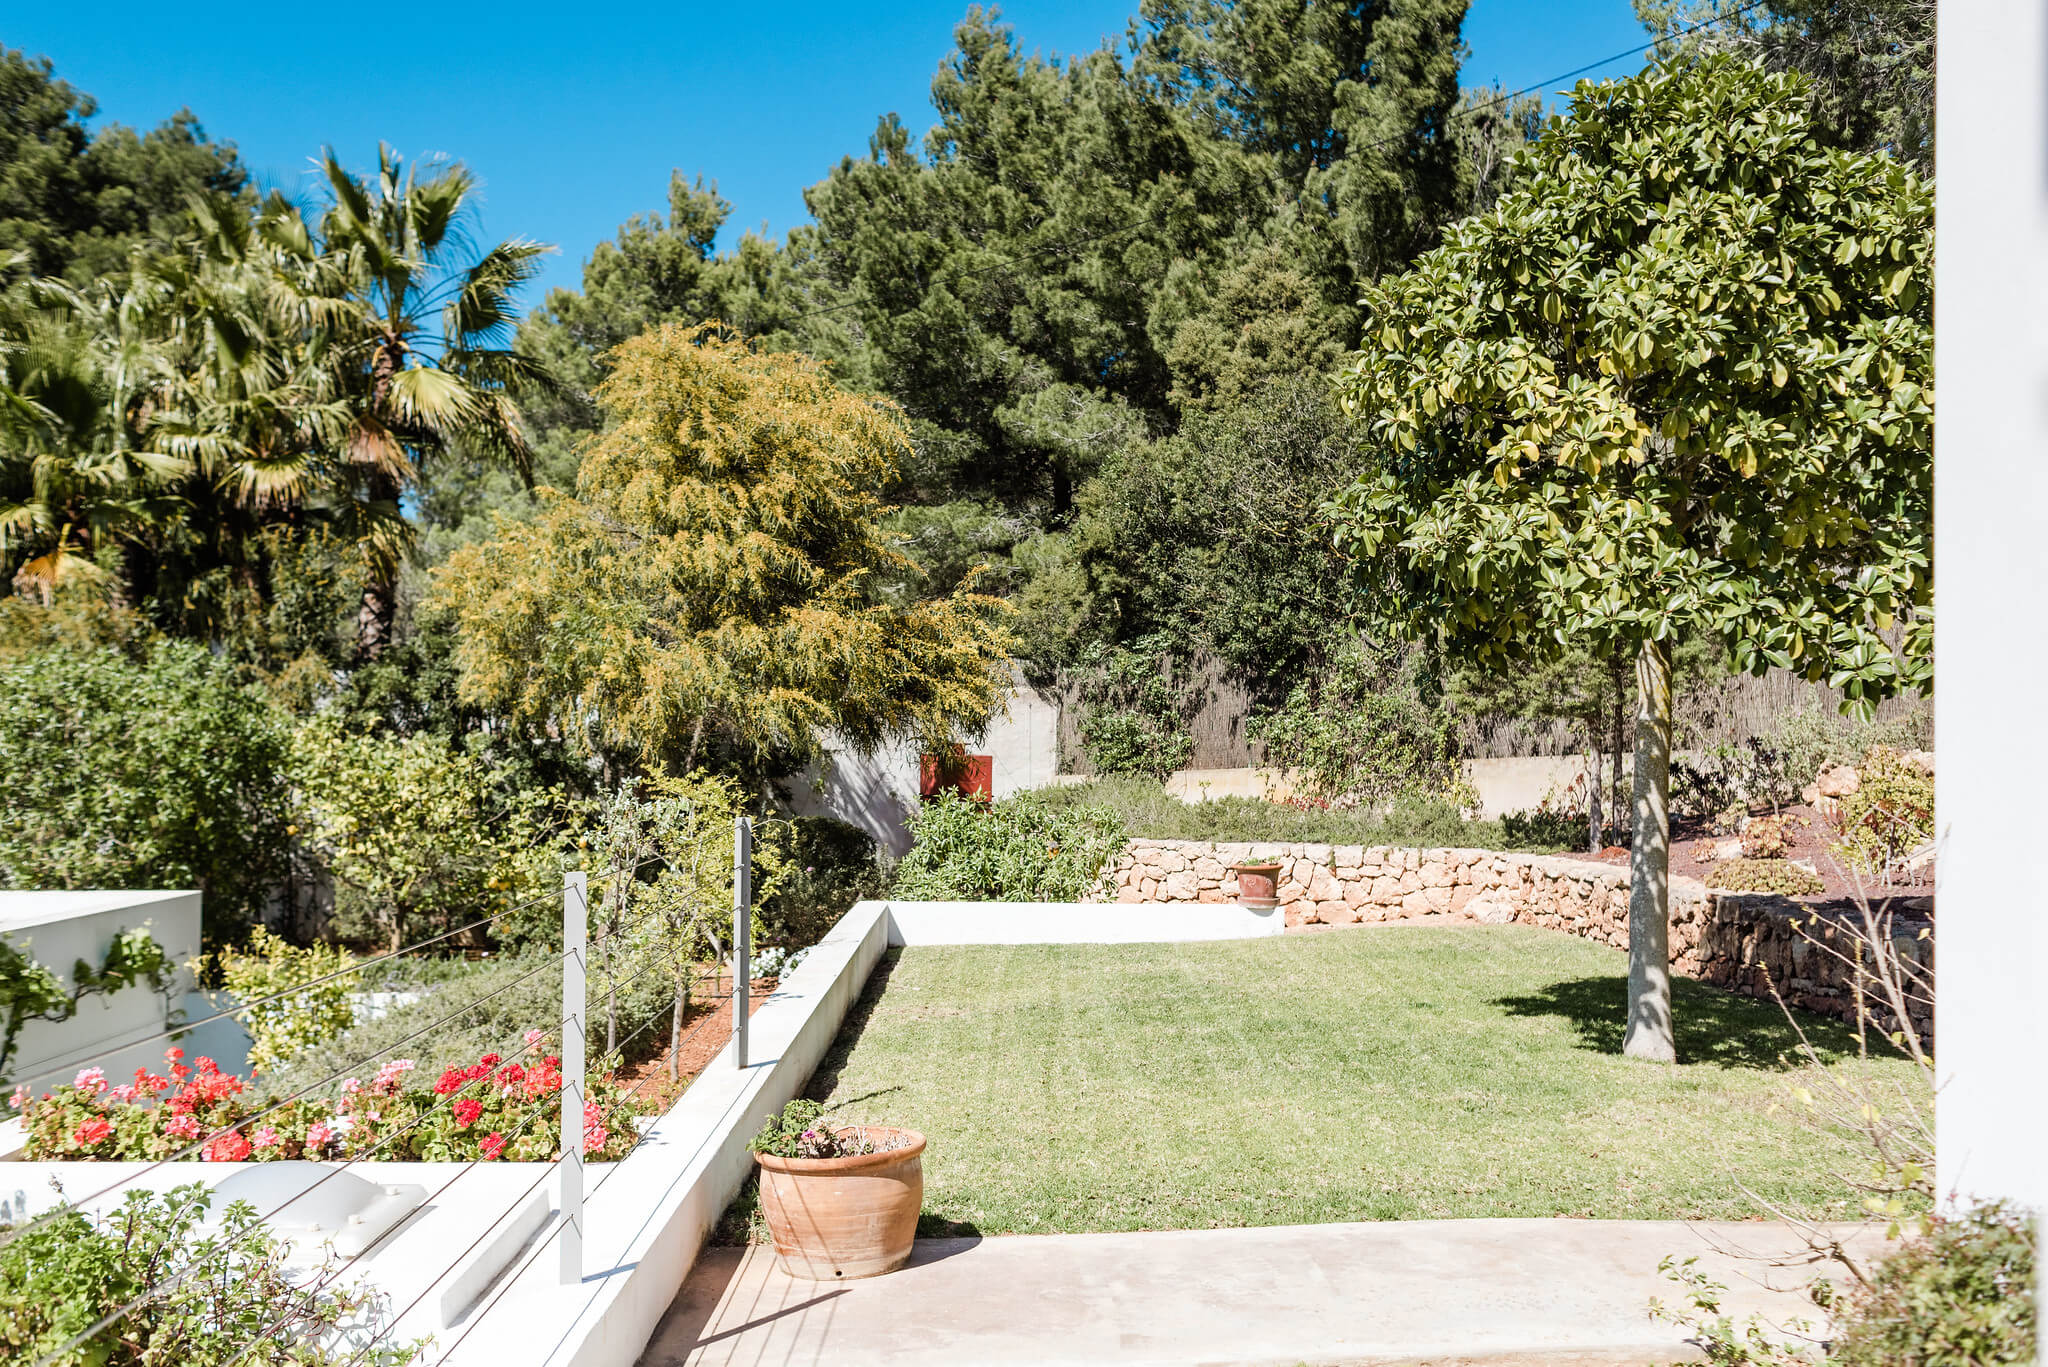 https://www.white-ibiza.com/wp-content/uploads/2020/06/white-ibiza-villas-casa-nyah-exterior-garden2.jpg